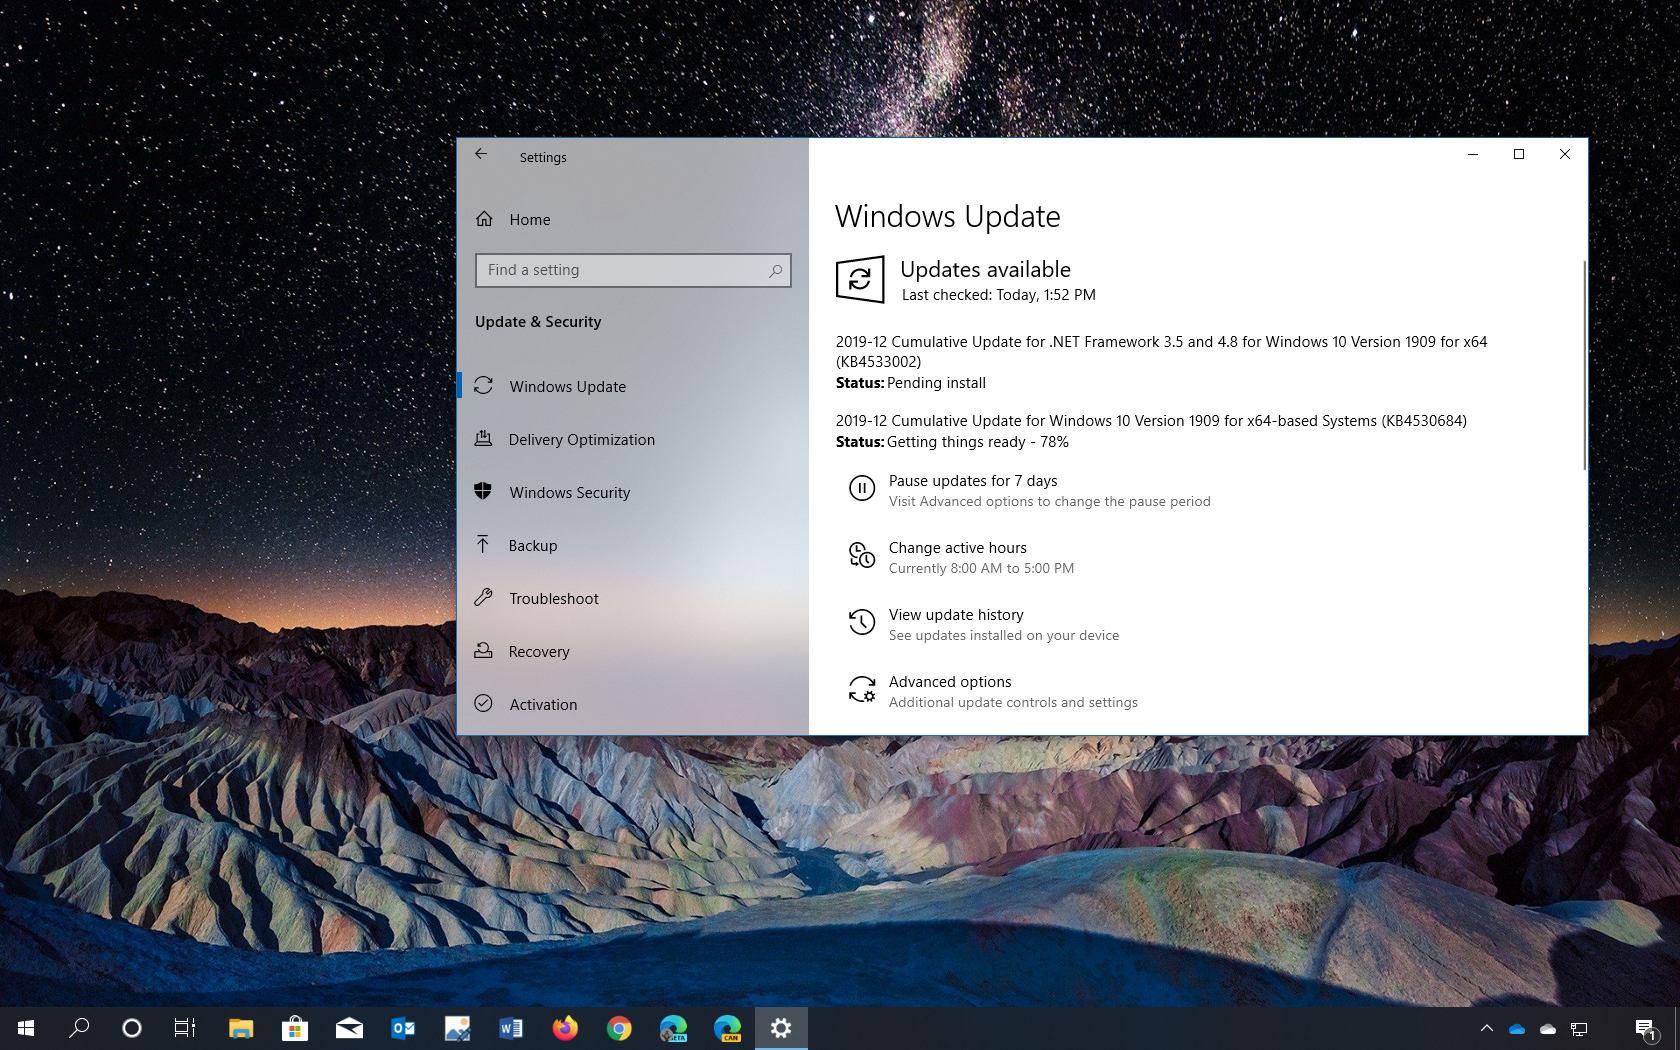 Windows 10 update KB4530684 download